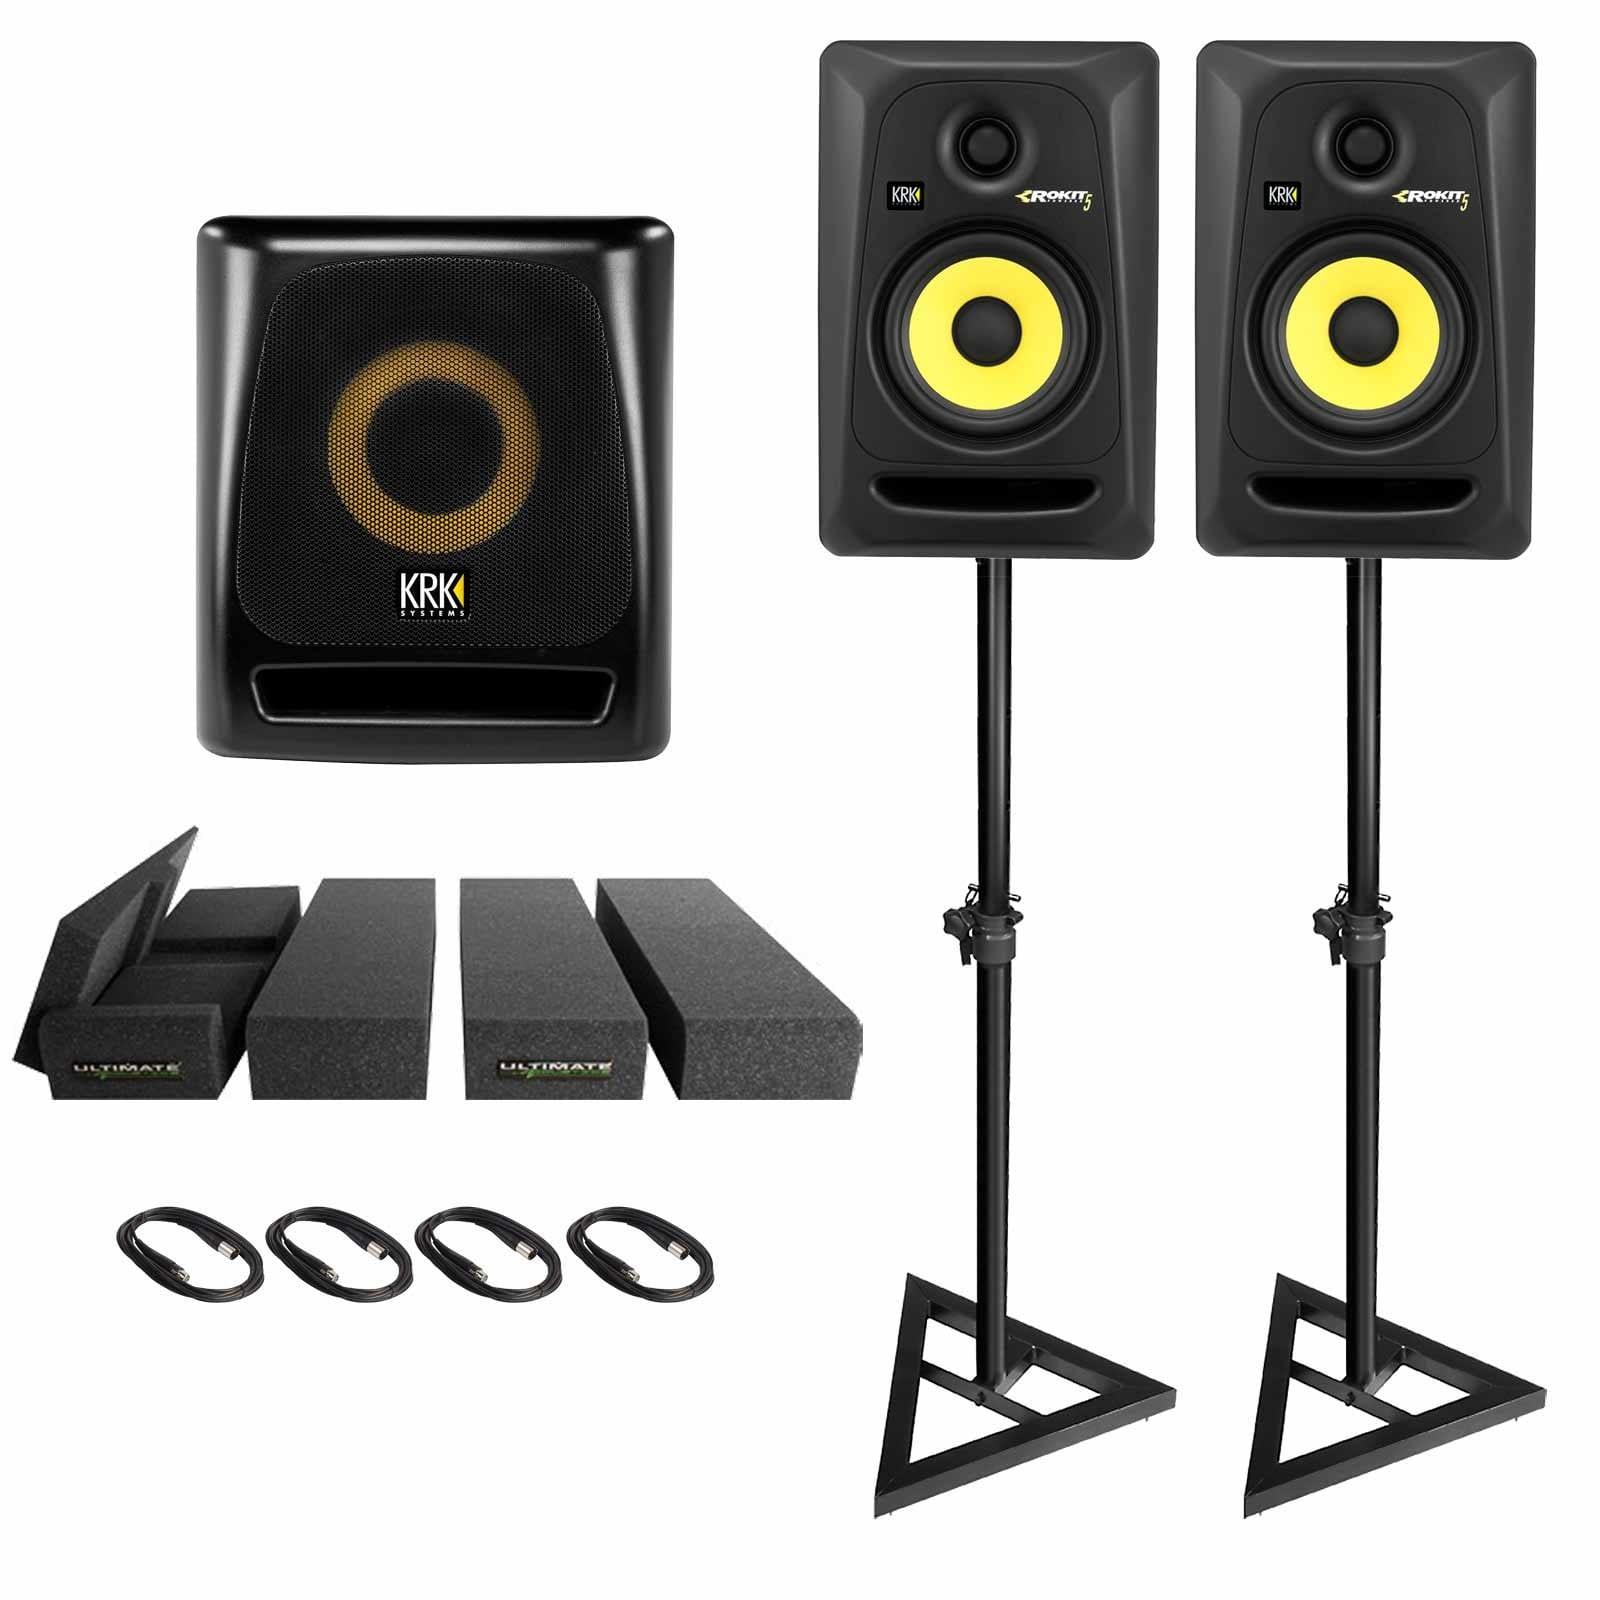 2-krk-rokit-5-g3-rp5g3-5-powered-studio-monitor-speakers-with-krk-8s2-v2-powered-8-studio-subwoofer-package-5b8